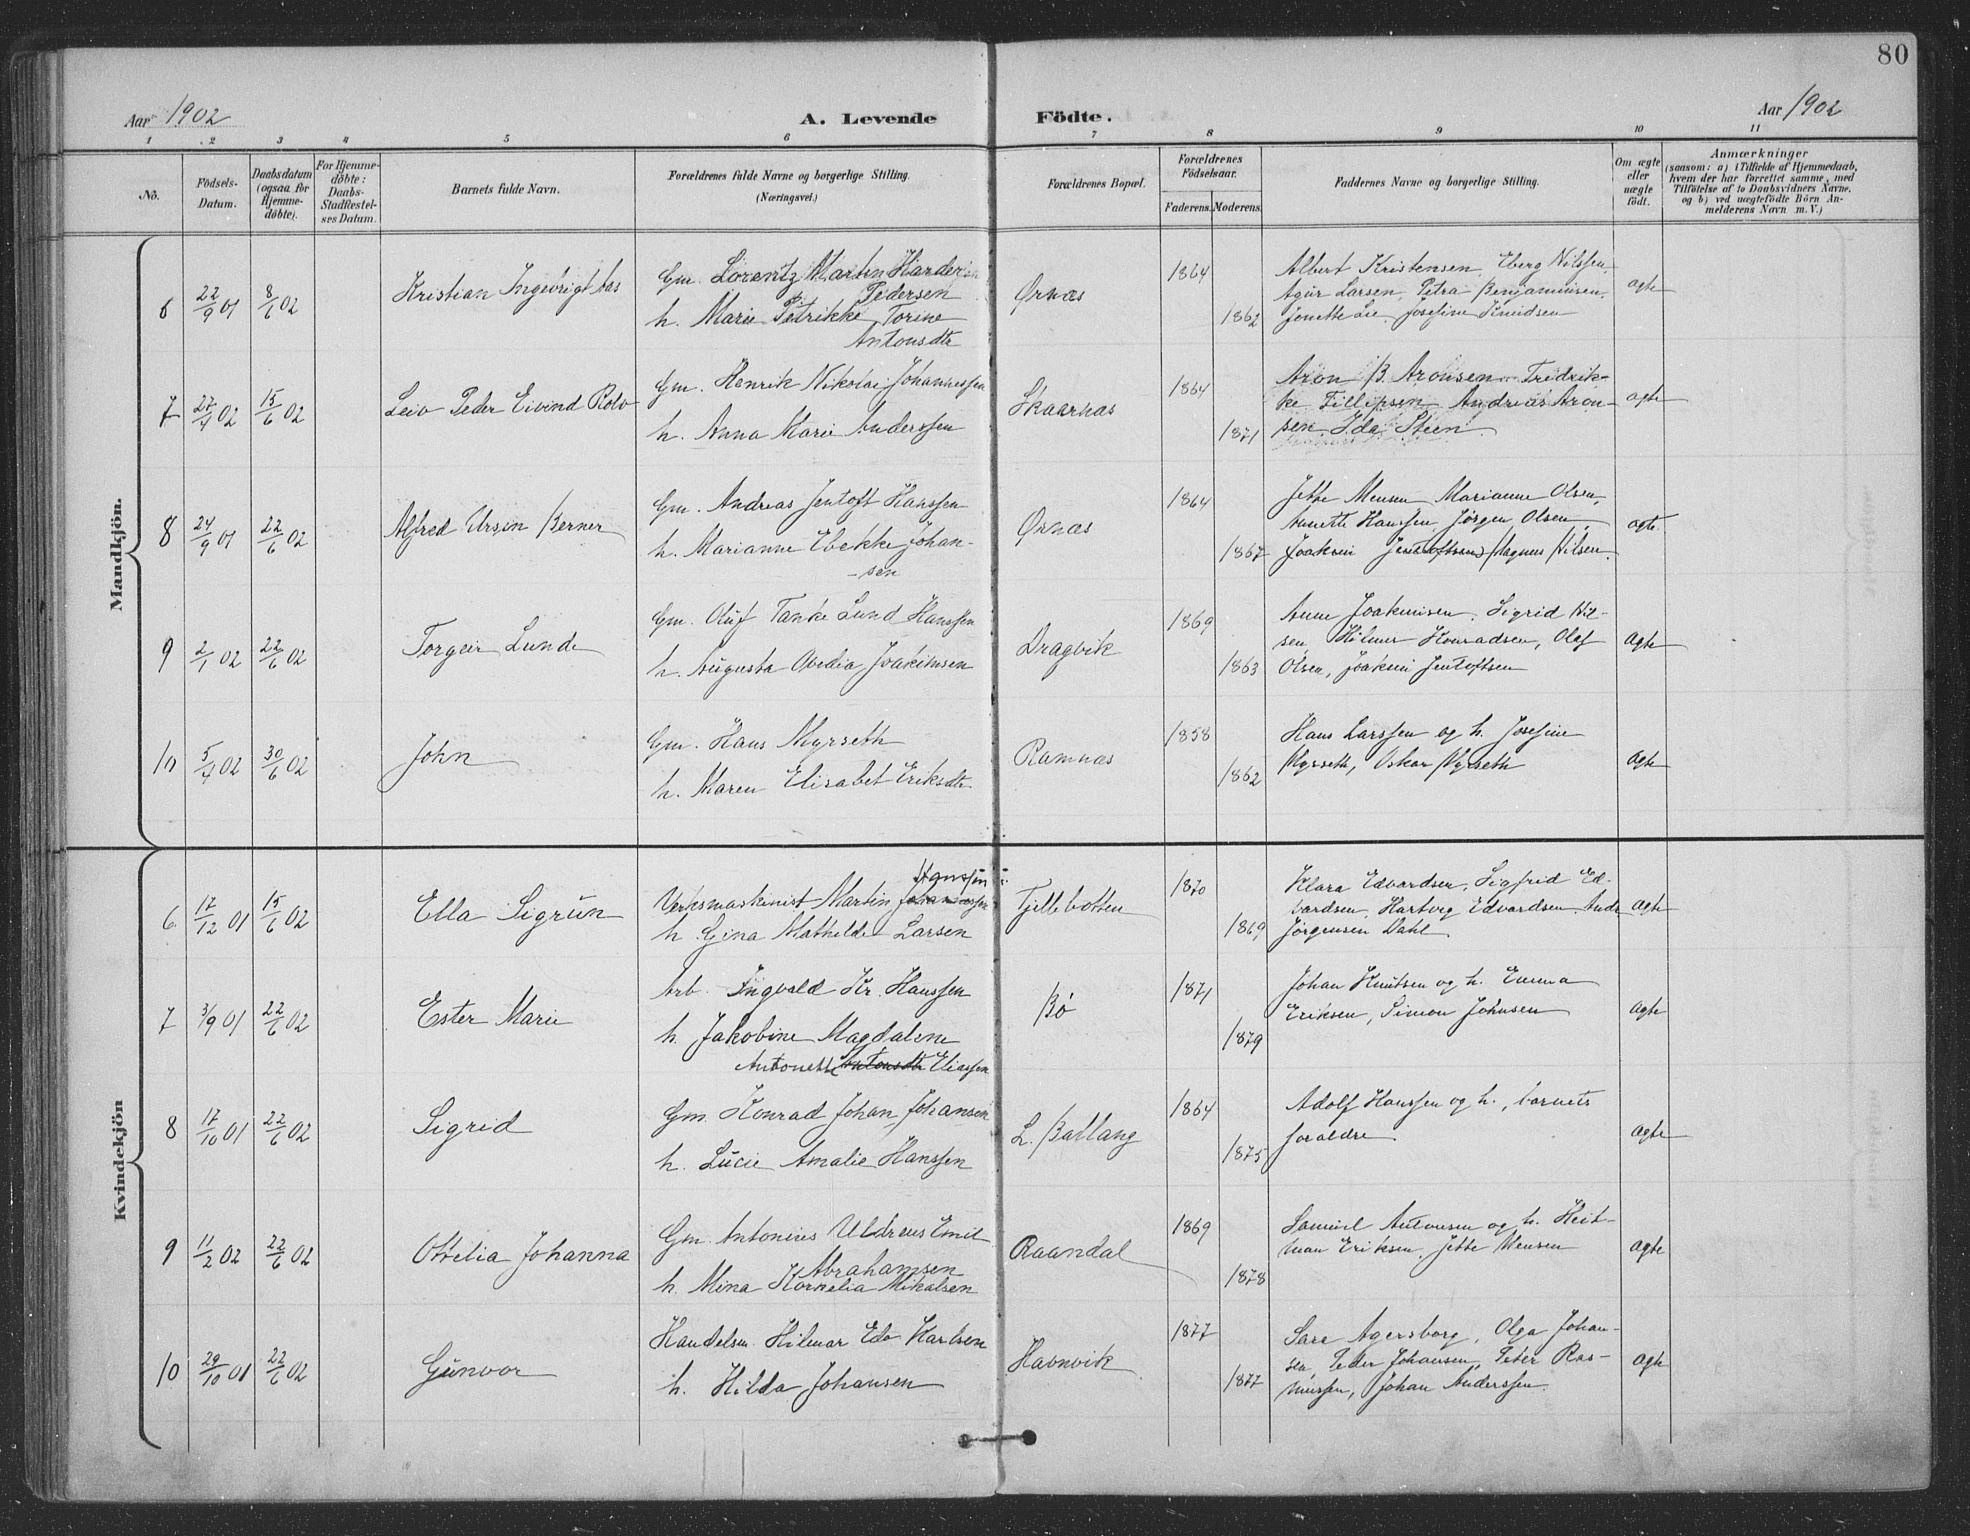 SAT, Ministerialprotokoller, klokkerbøker og fødselsregistre - Nordland, 863/L0899: Ministerialbok nr. 863A11, 1897-1906, s. 80